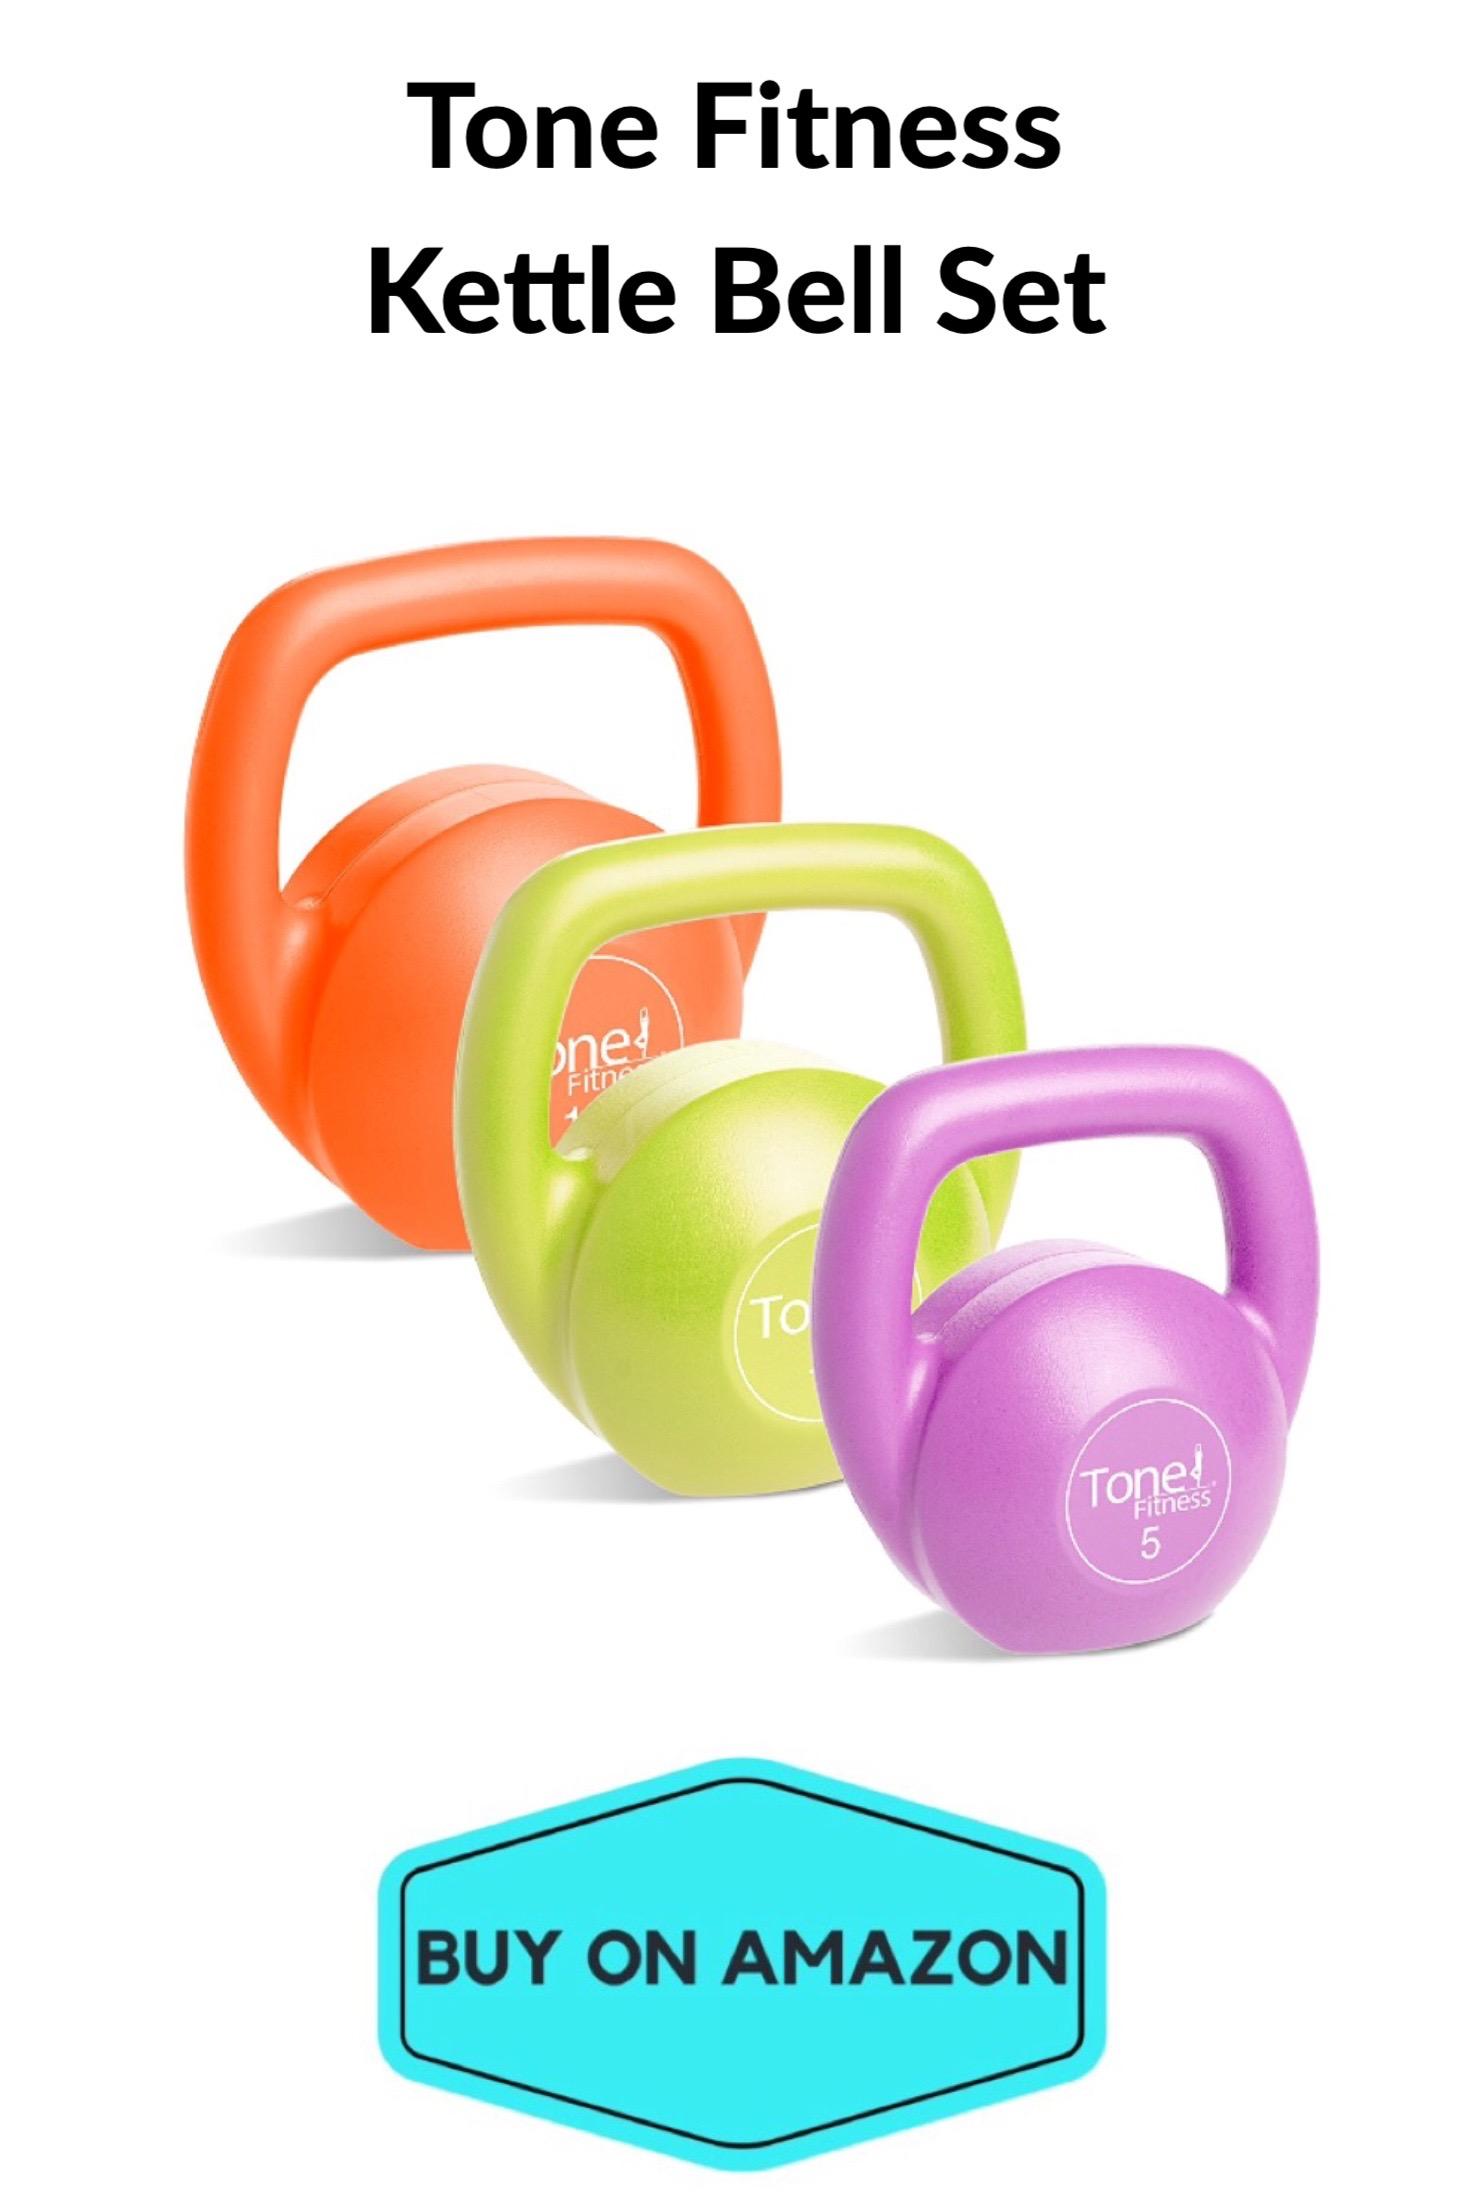 Tone Fitness Kettle Bell Set